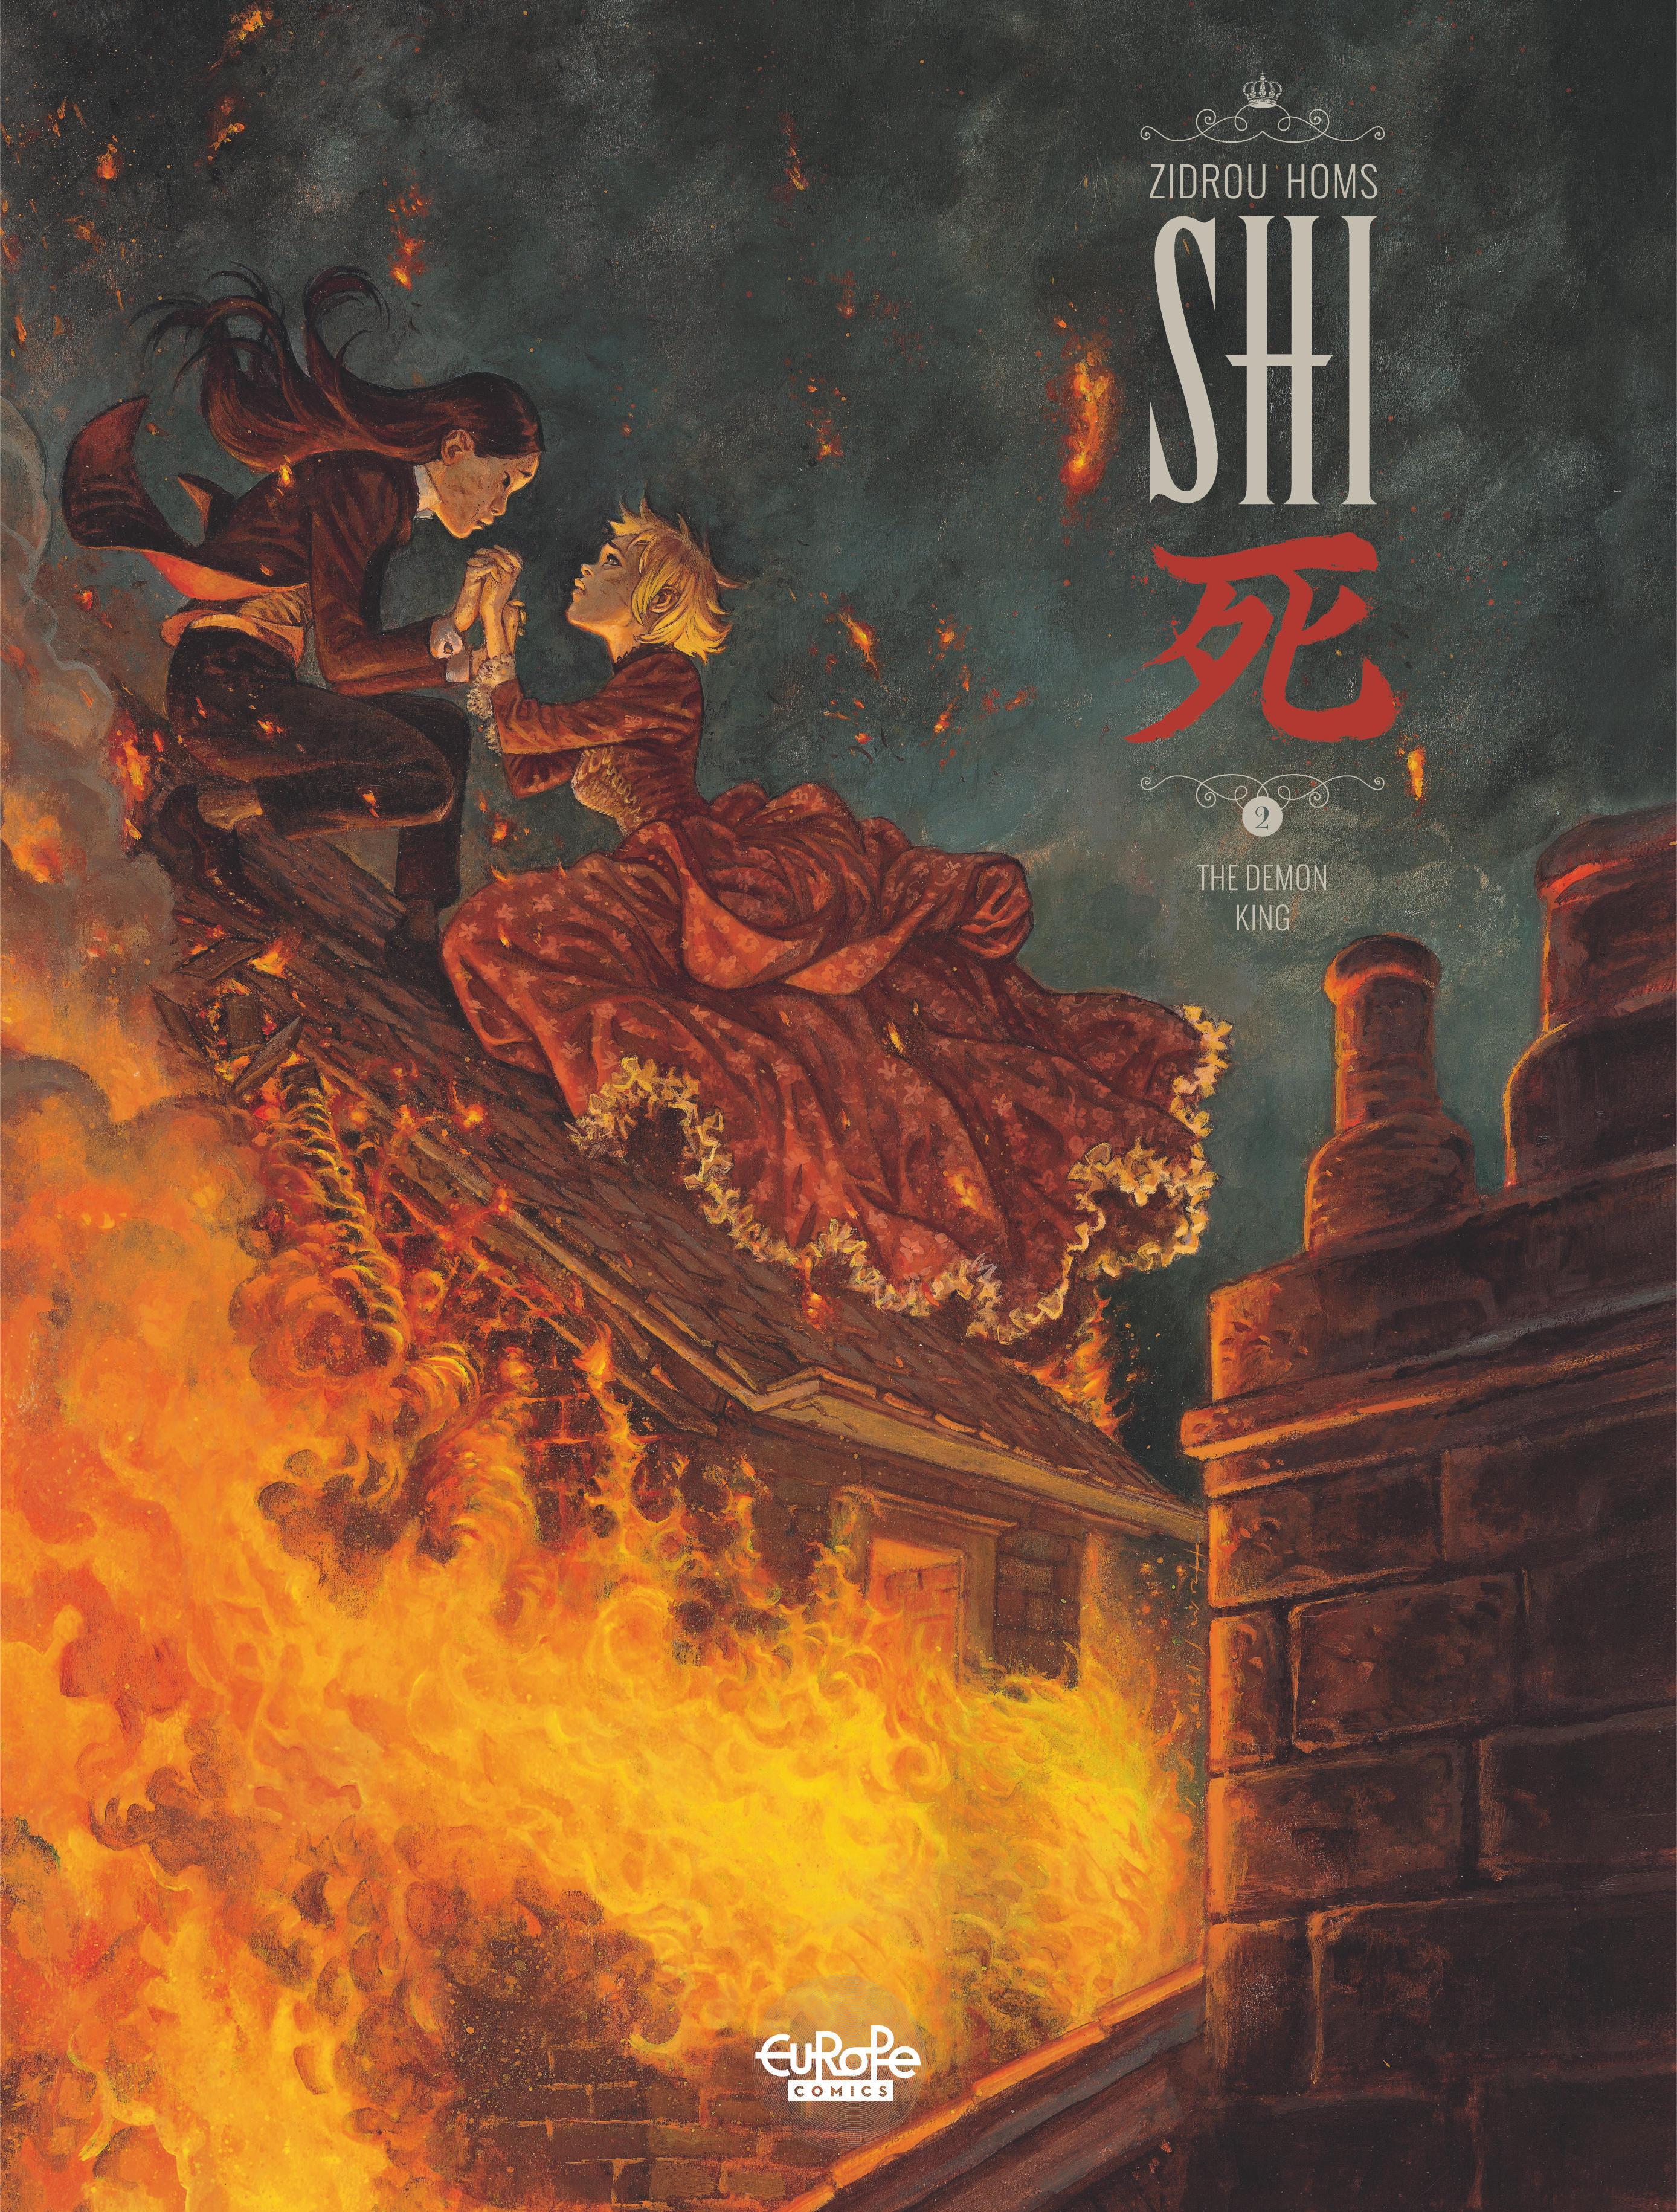 SHI - Volume 2 - The Demon King